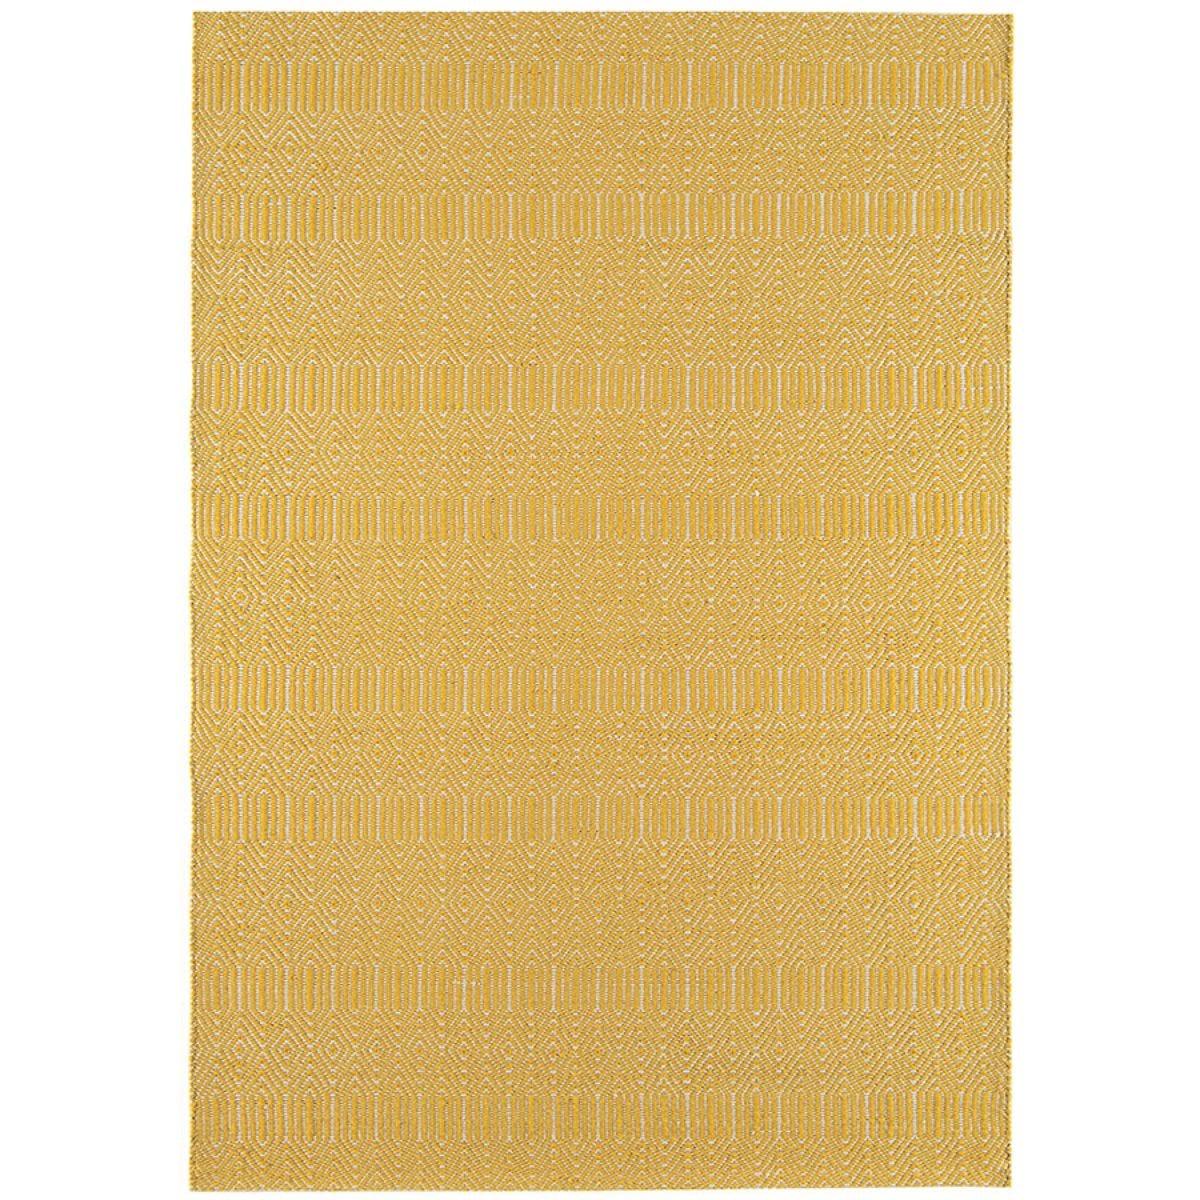 Asiatic Sloan Rug, 100 x 150cm - Mustard